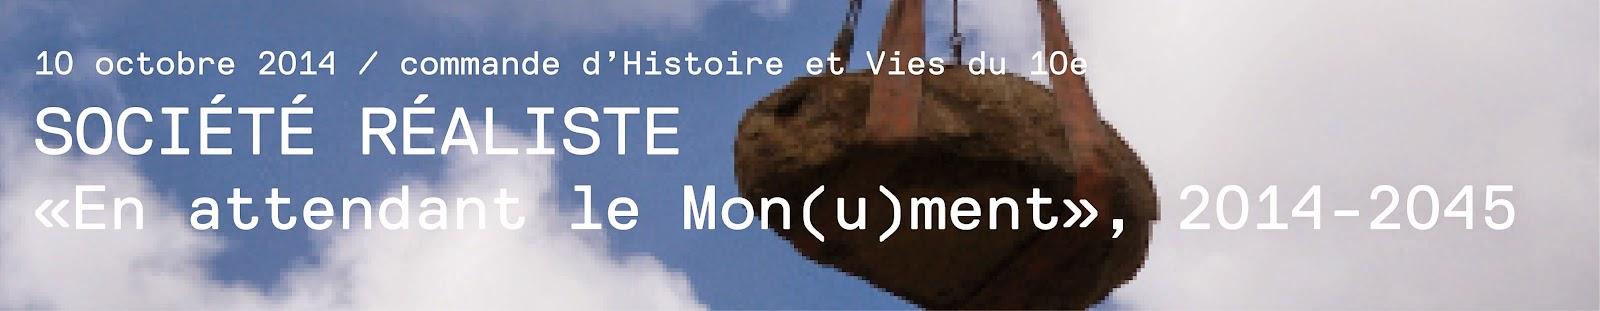 http://www.objetdeproduction.com/2013/05/societe-realiste-commande-de-la-societe.html